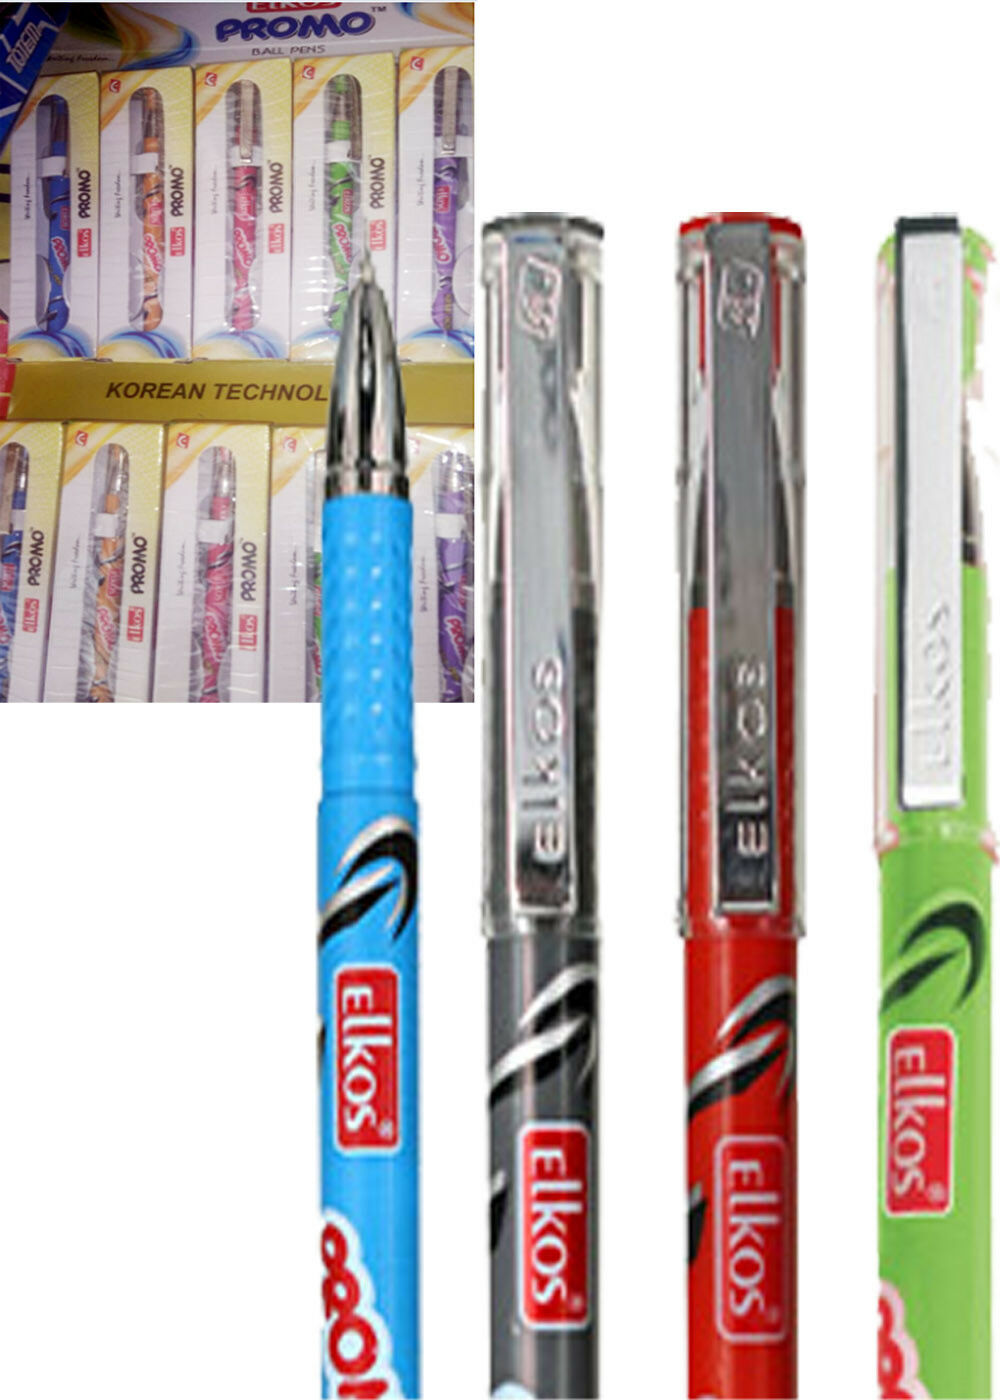 Elkos promo ball pen bluee 50 Pcs Free Shipping wholsale price